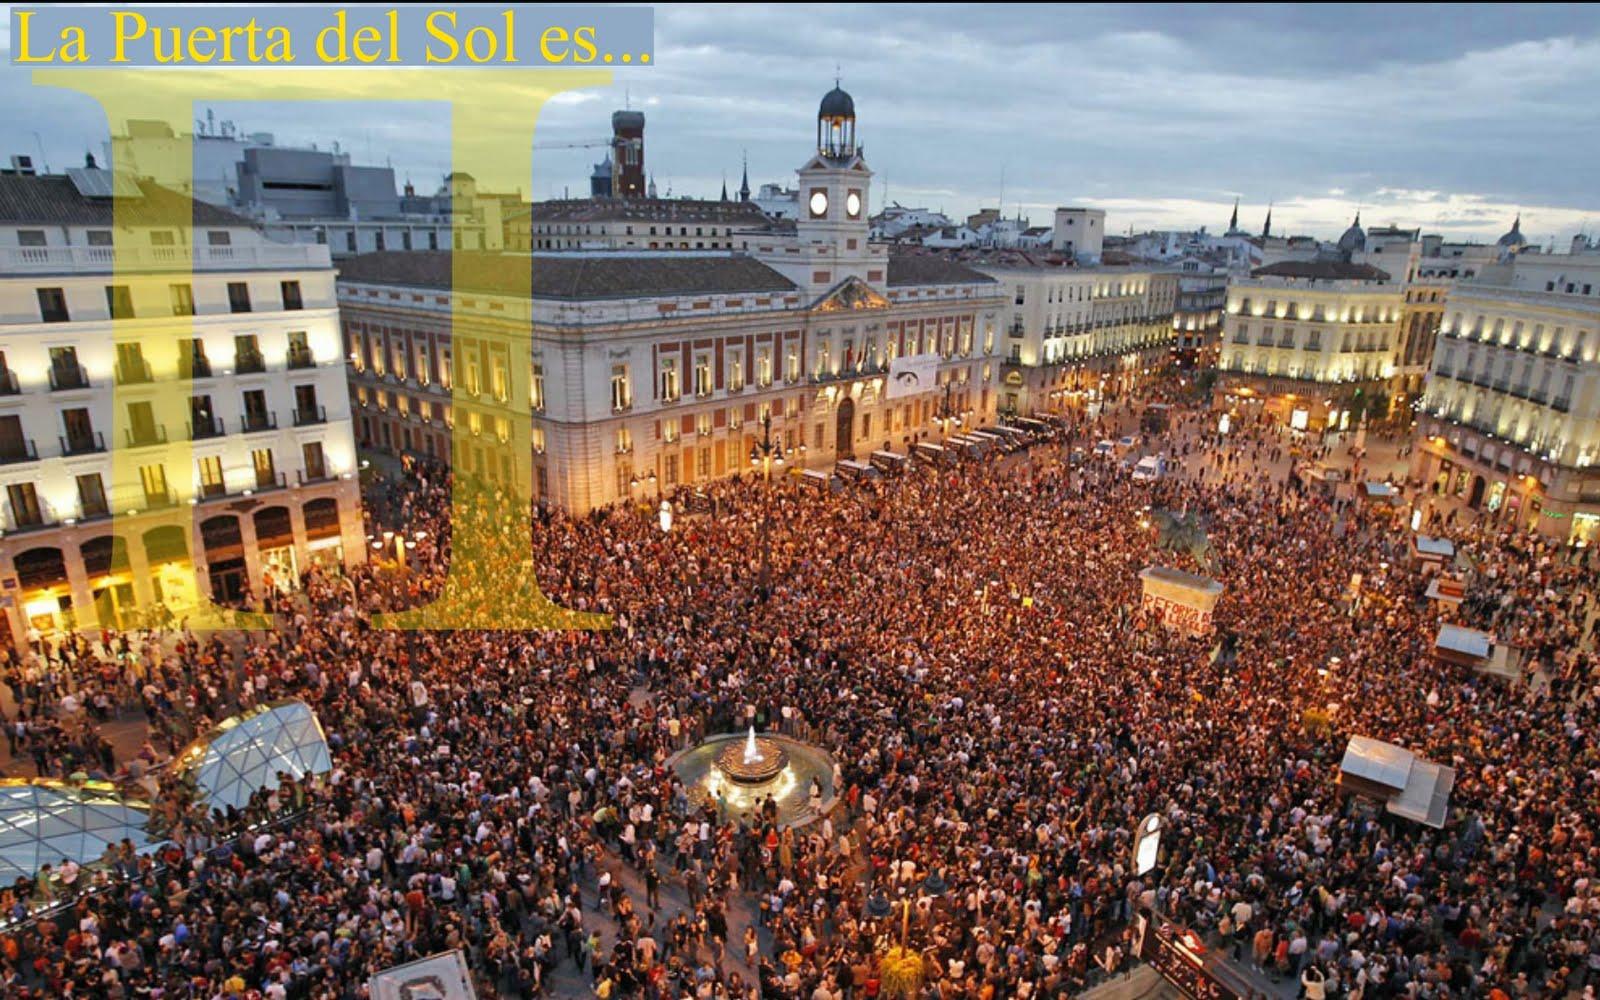 La sabiduria de la luz la puerta del sol una revoluci n for Puerta del sol ahora